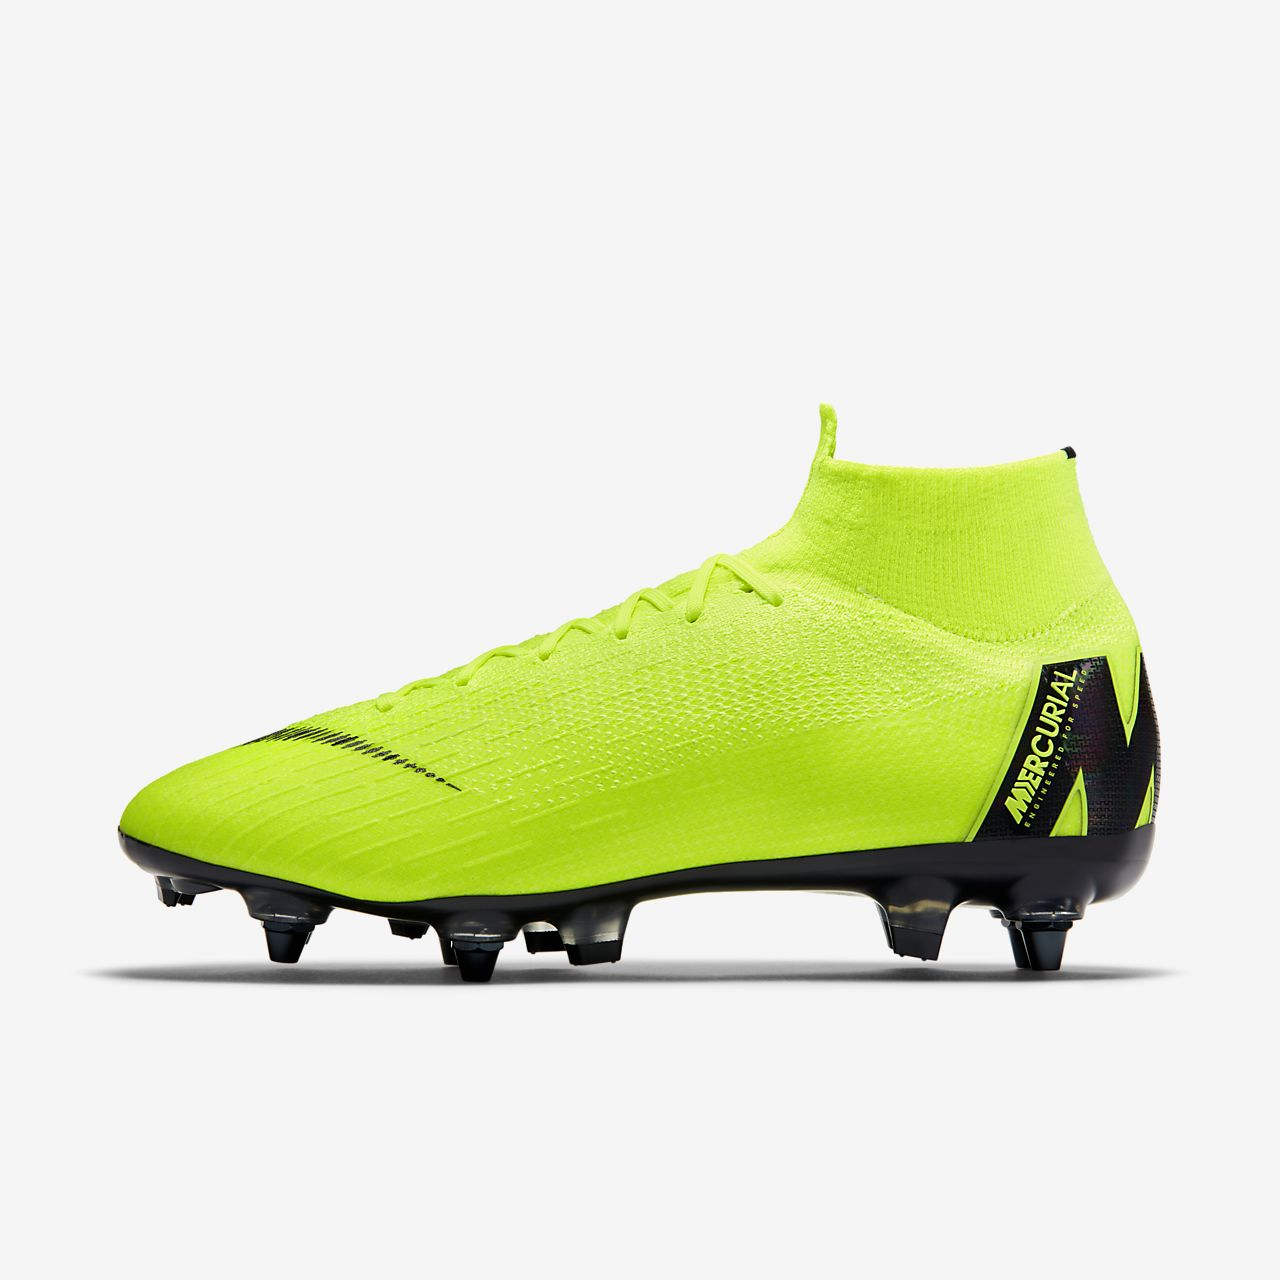 ... Nike Mercurial Superfly 360 Elite SG-PRO Anti-Clog Botas de fútbol para  terreno bc68d2e9c567b